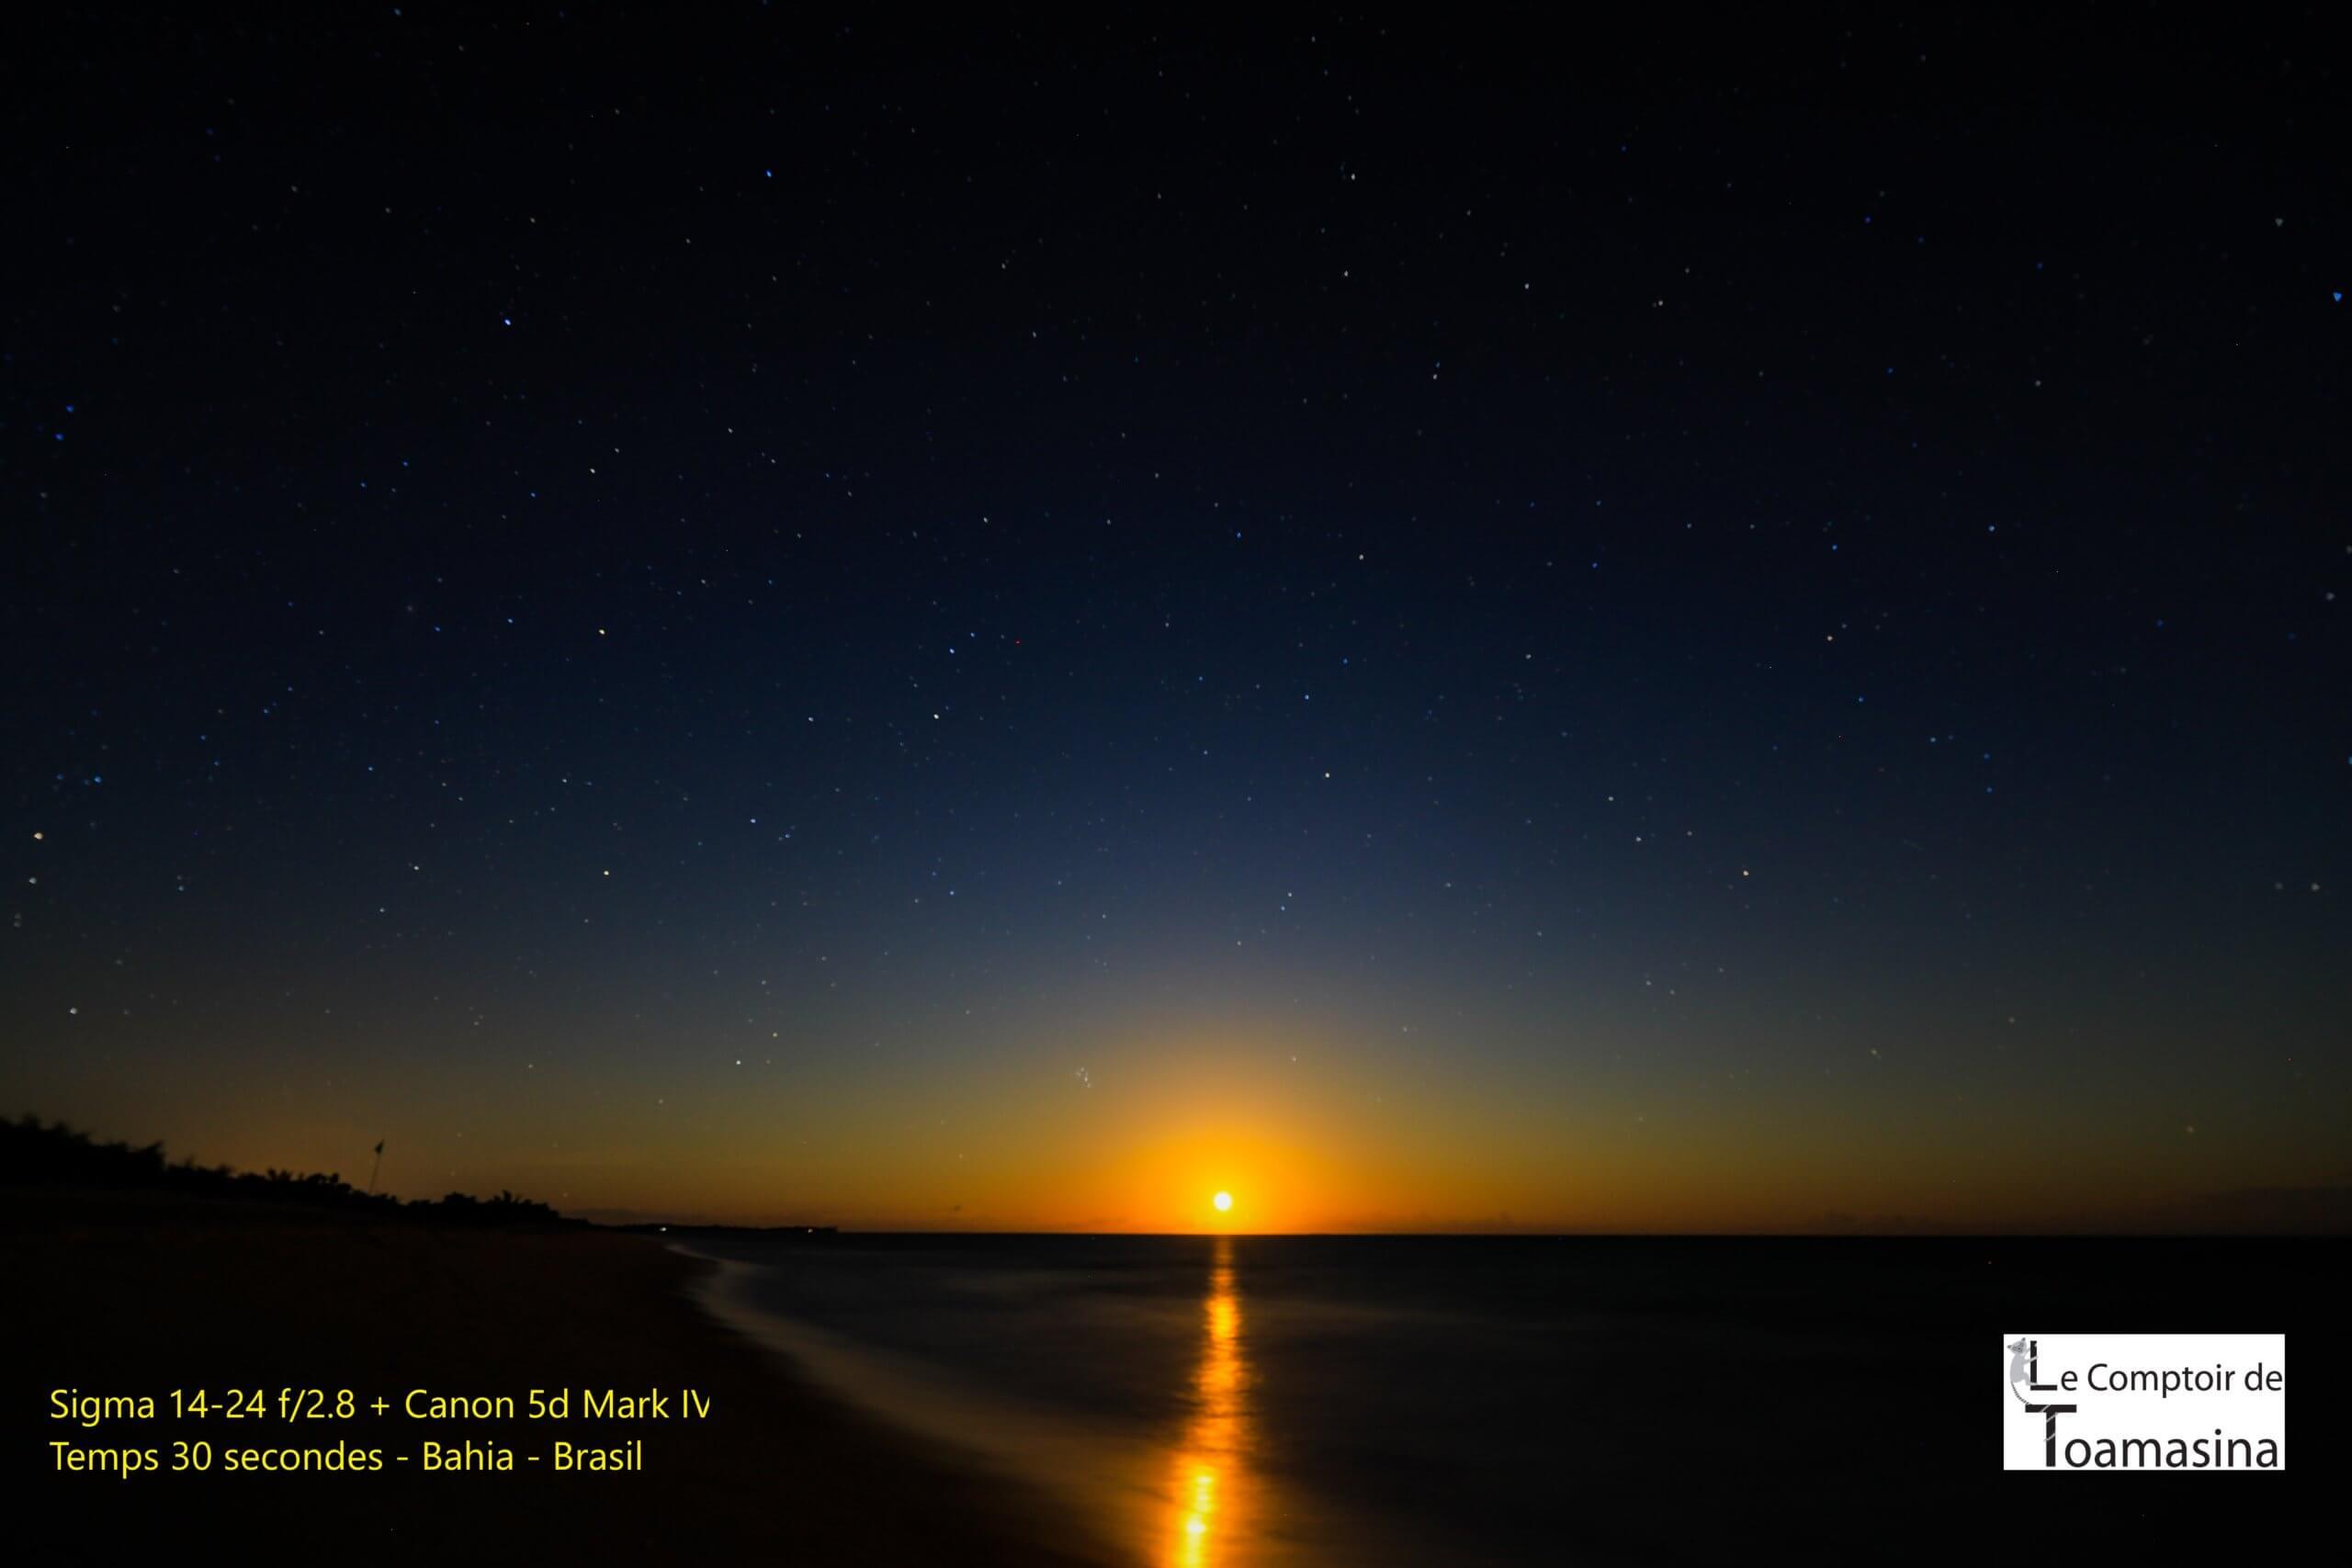 Bahia de nuit - photo sigma 14-24 f/2.8